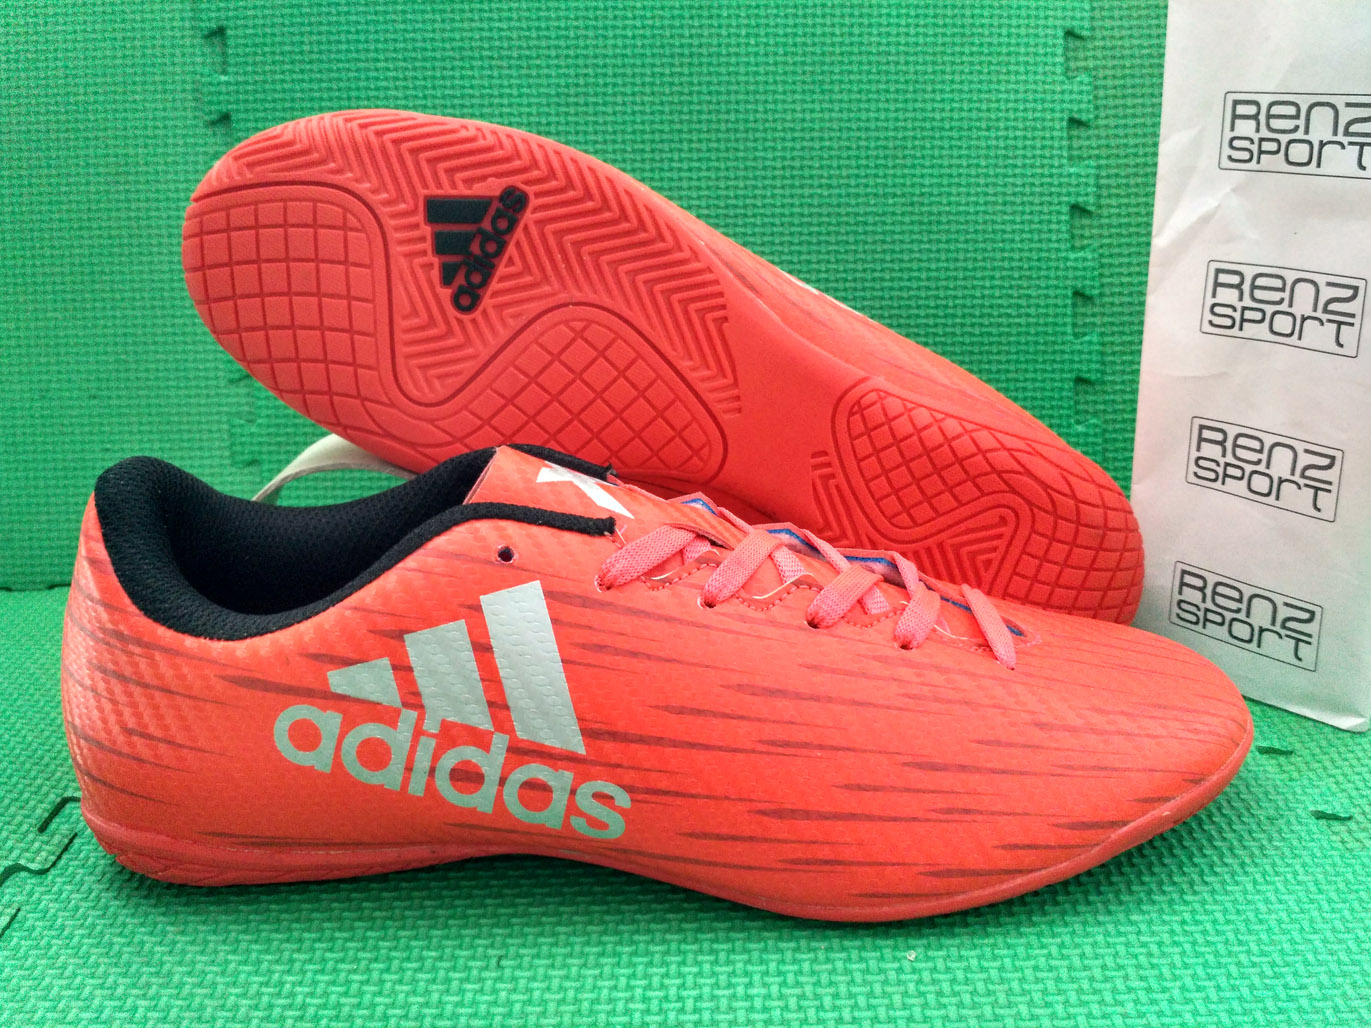 Jual Sepatu Futsal ADIDAS X CHAOS 16.1 IC Red - Renz Sport ... 84dcd65aee